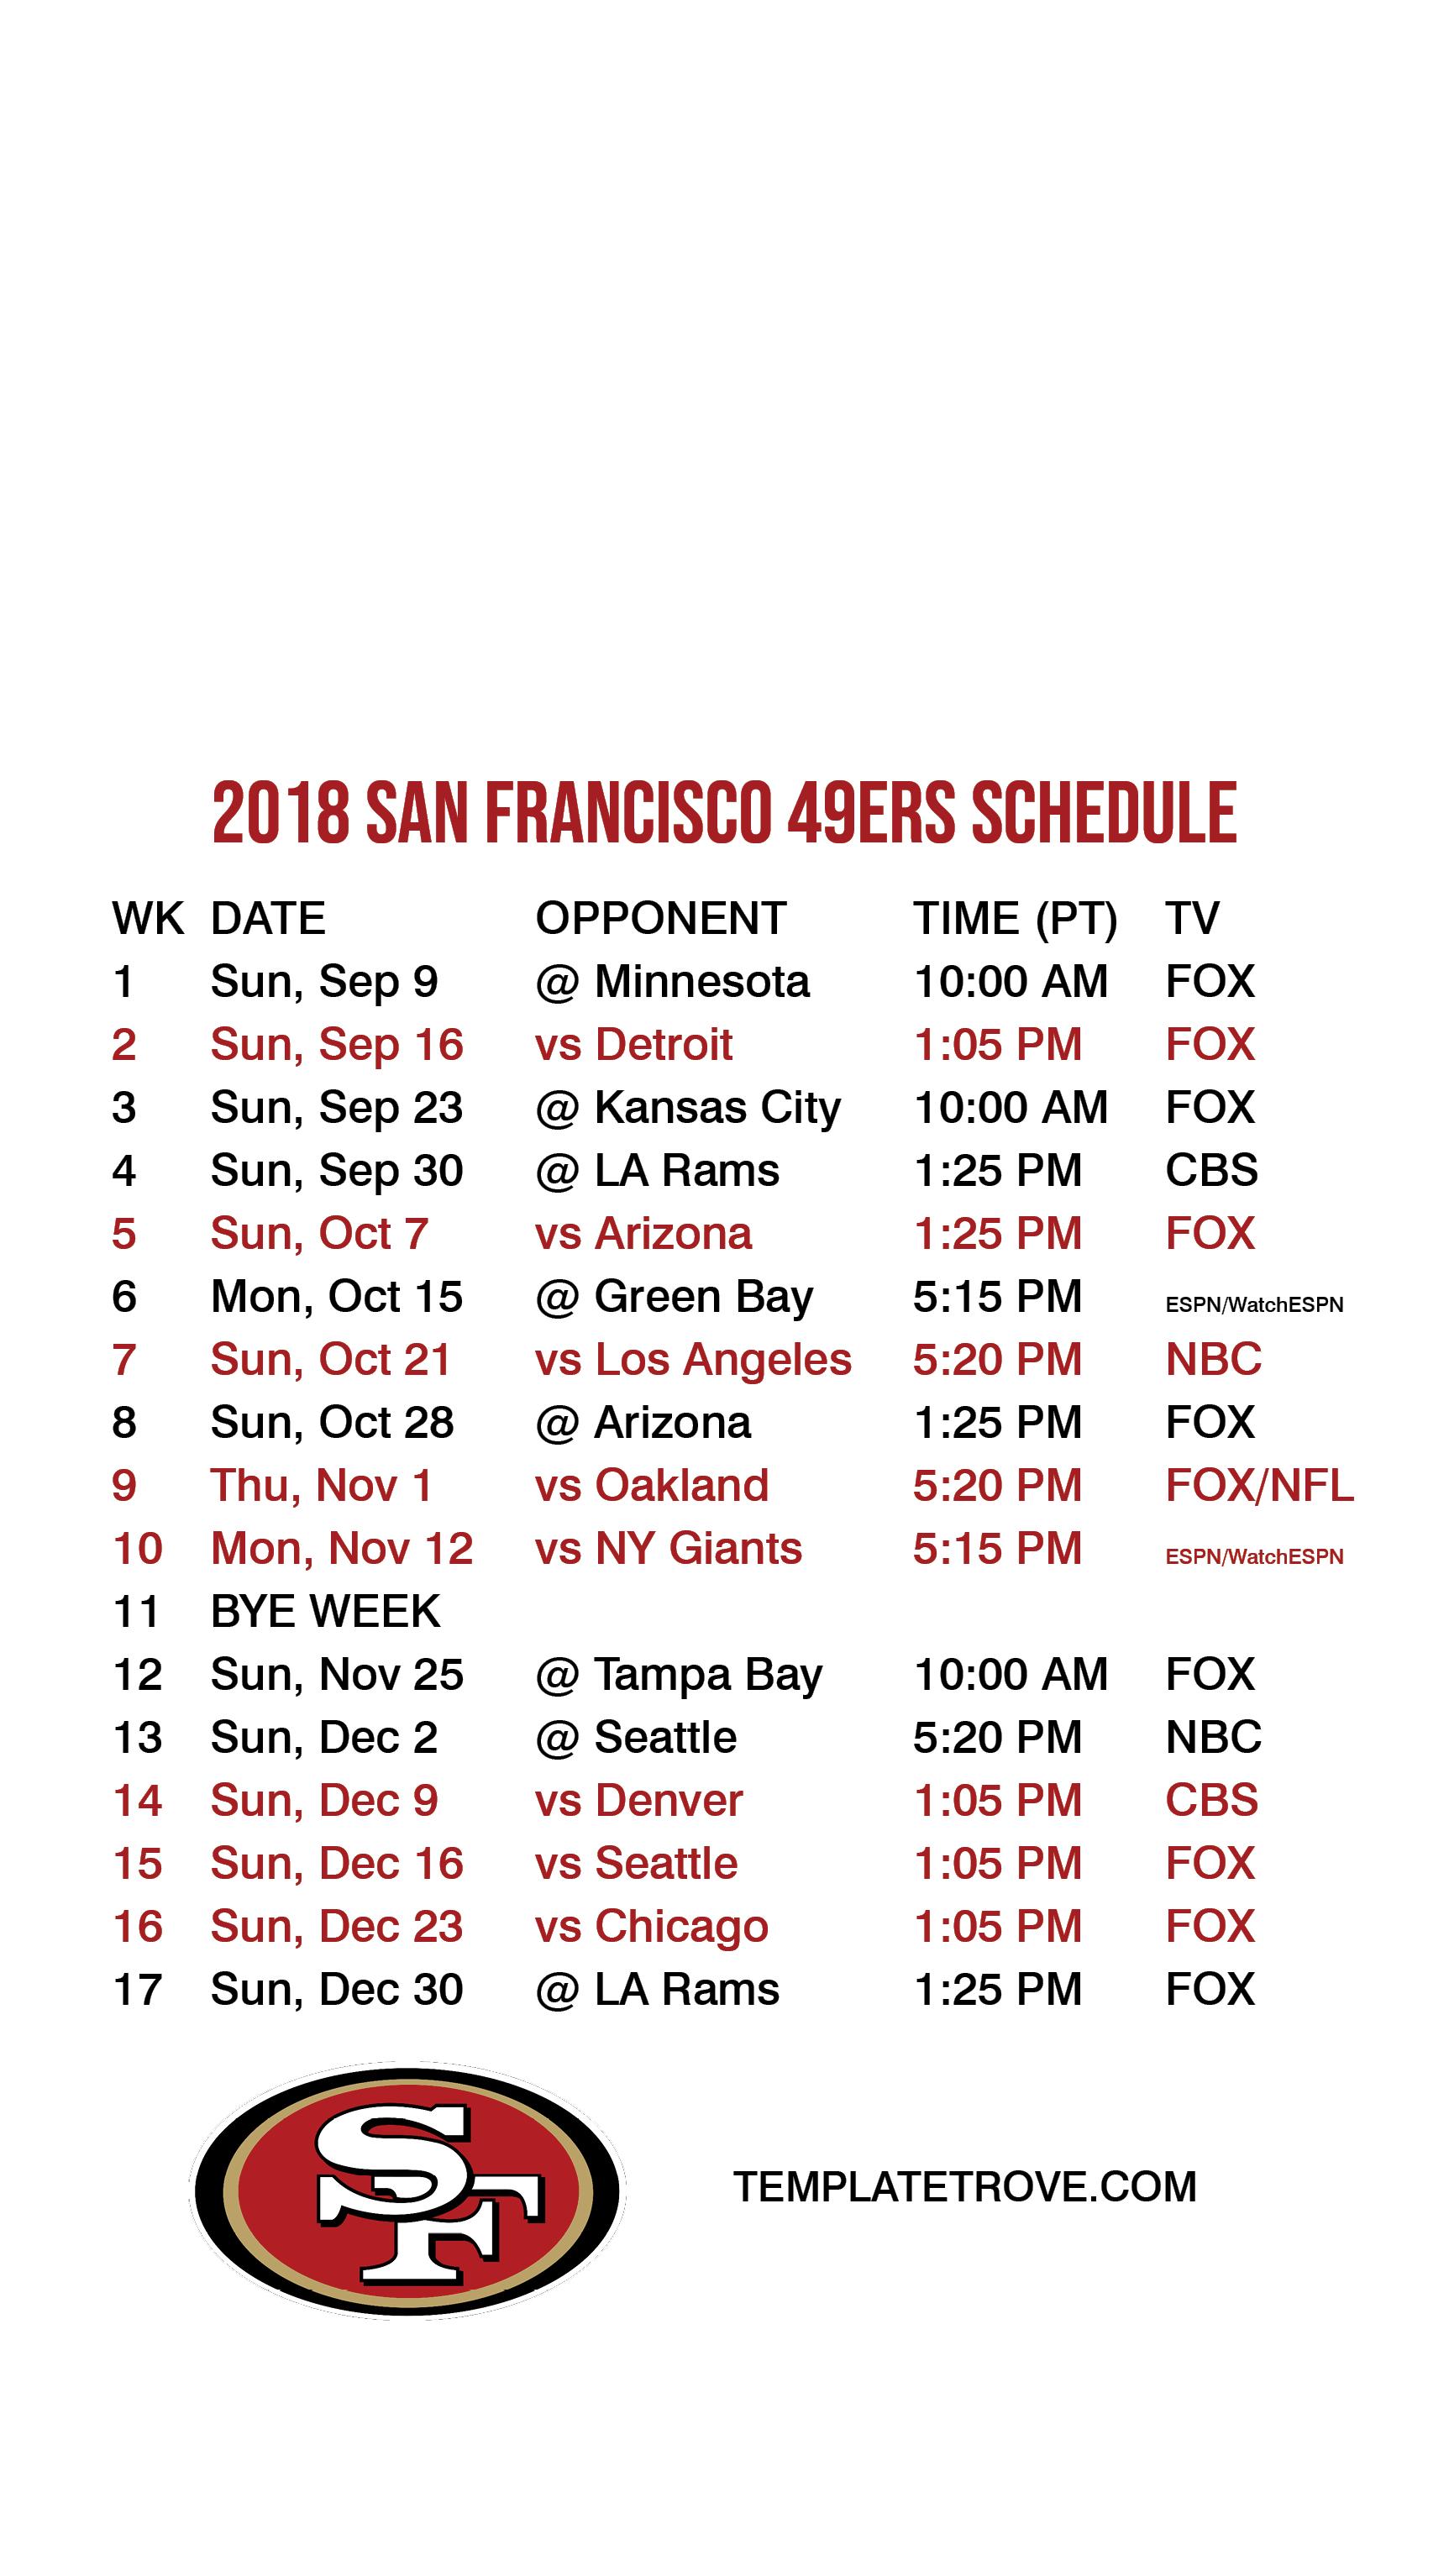 2018 2019 San Francisco 49Ers Lock Screen Schedule For Iphone 6 7 8 Plus 49Ers Calendar 2019